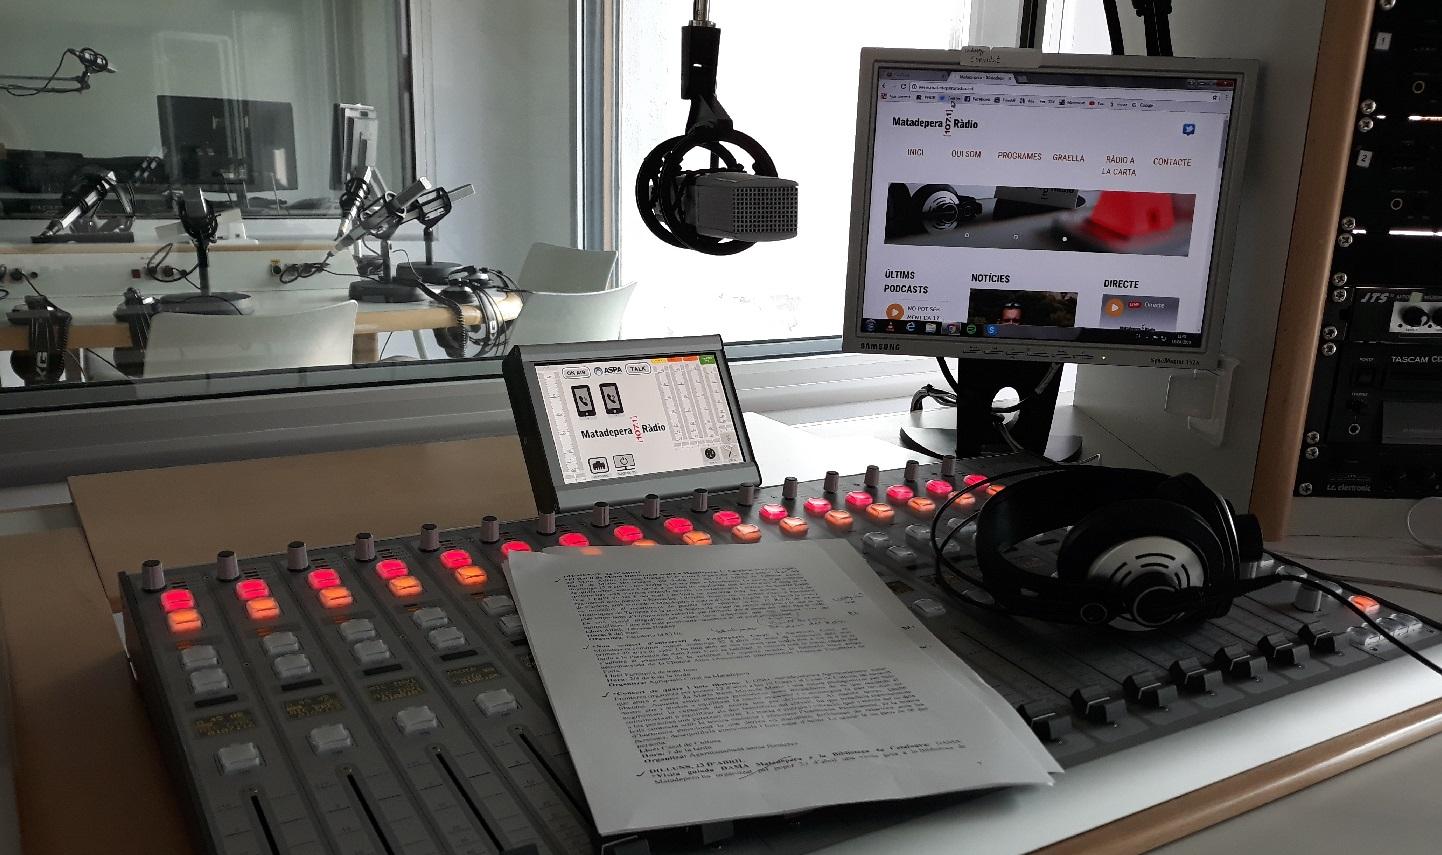 Matadepera Ràdio